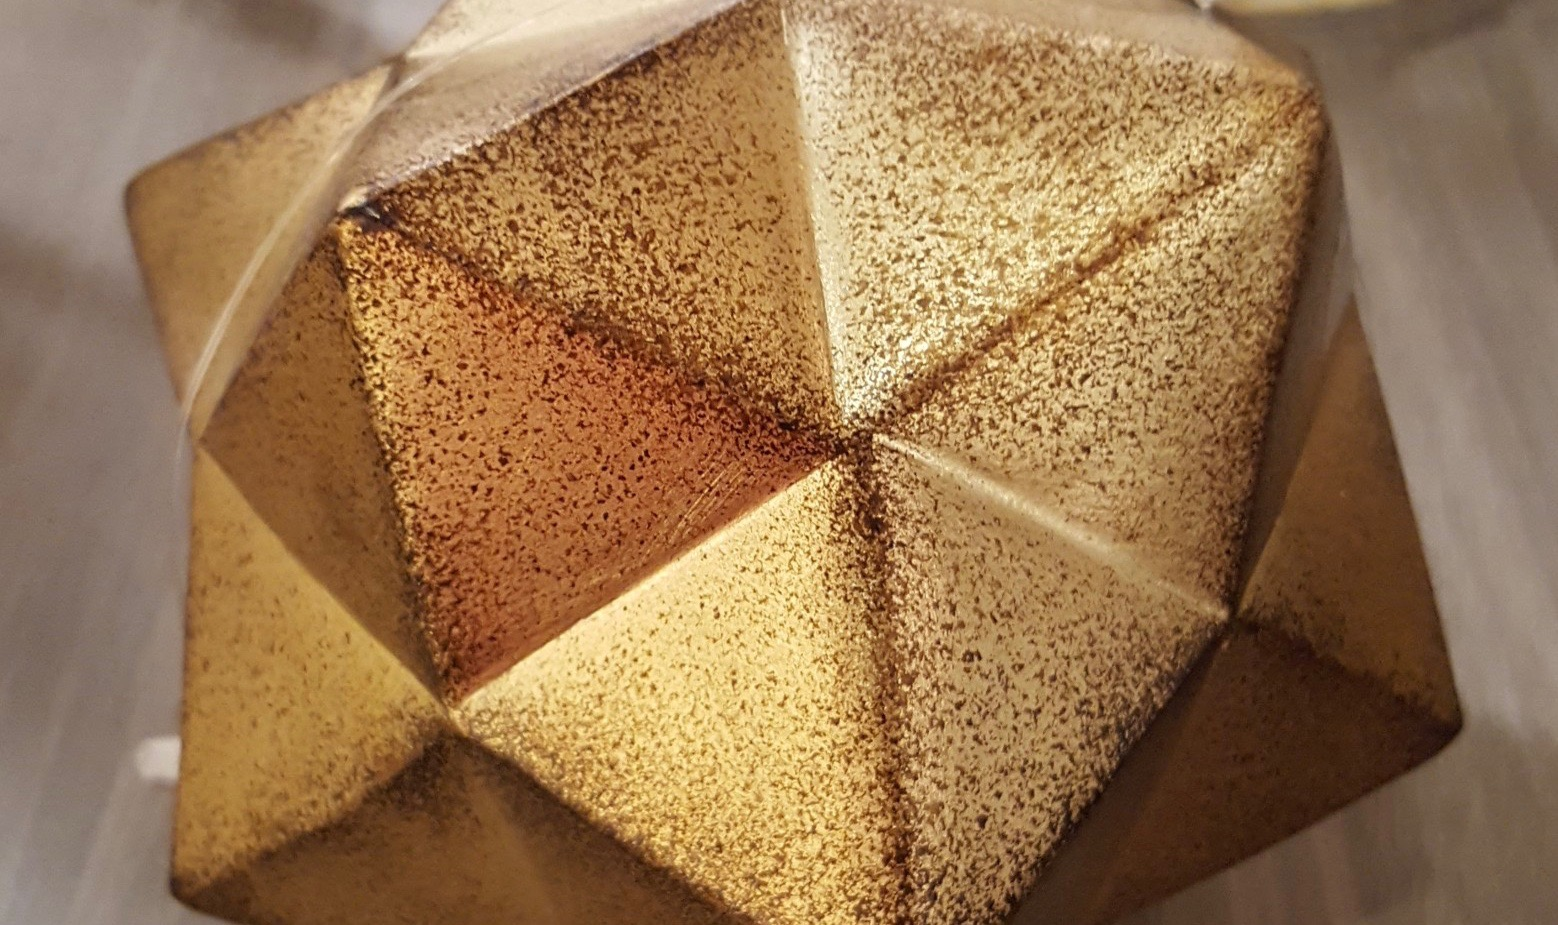 PolyhedralPop